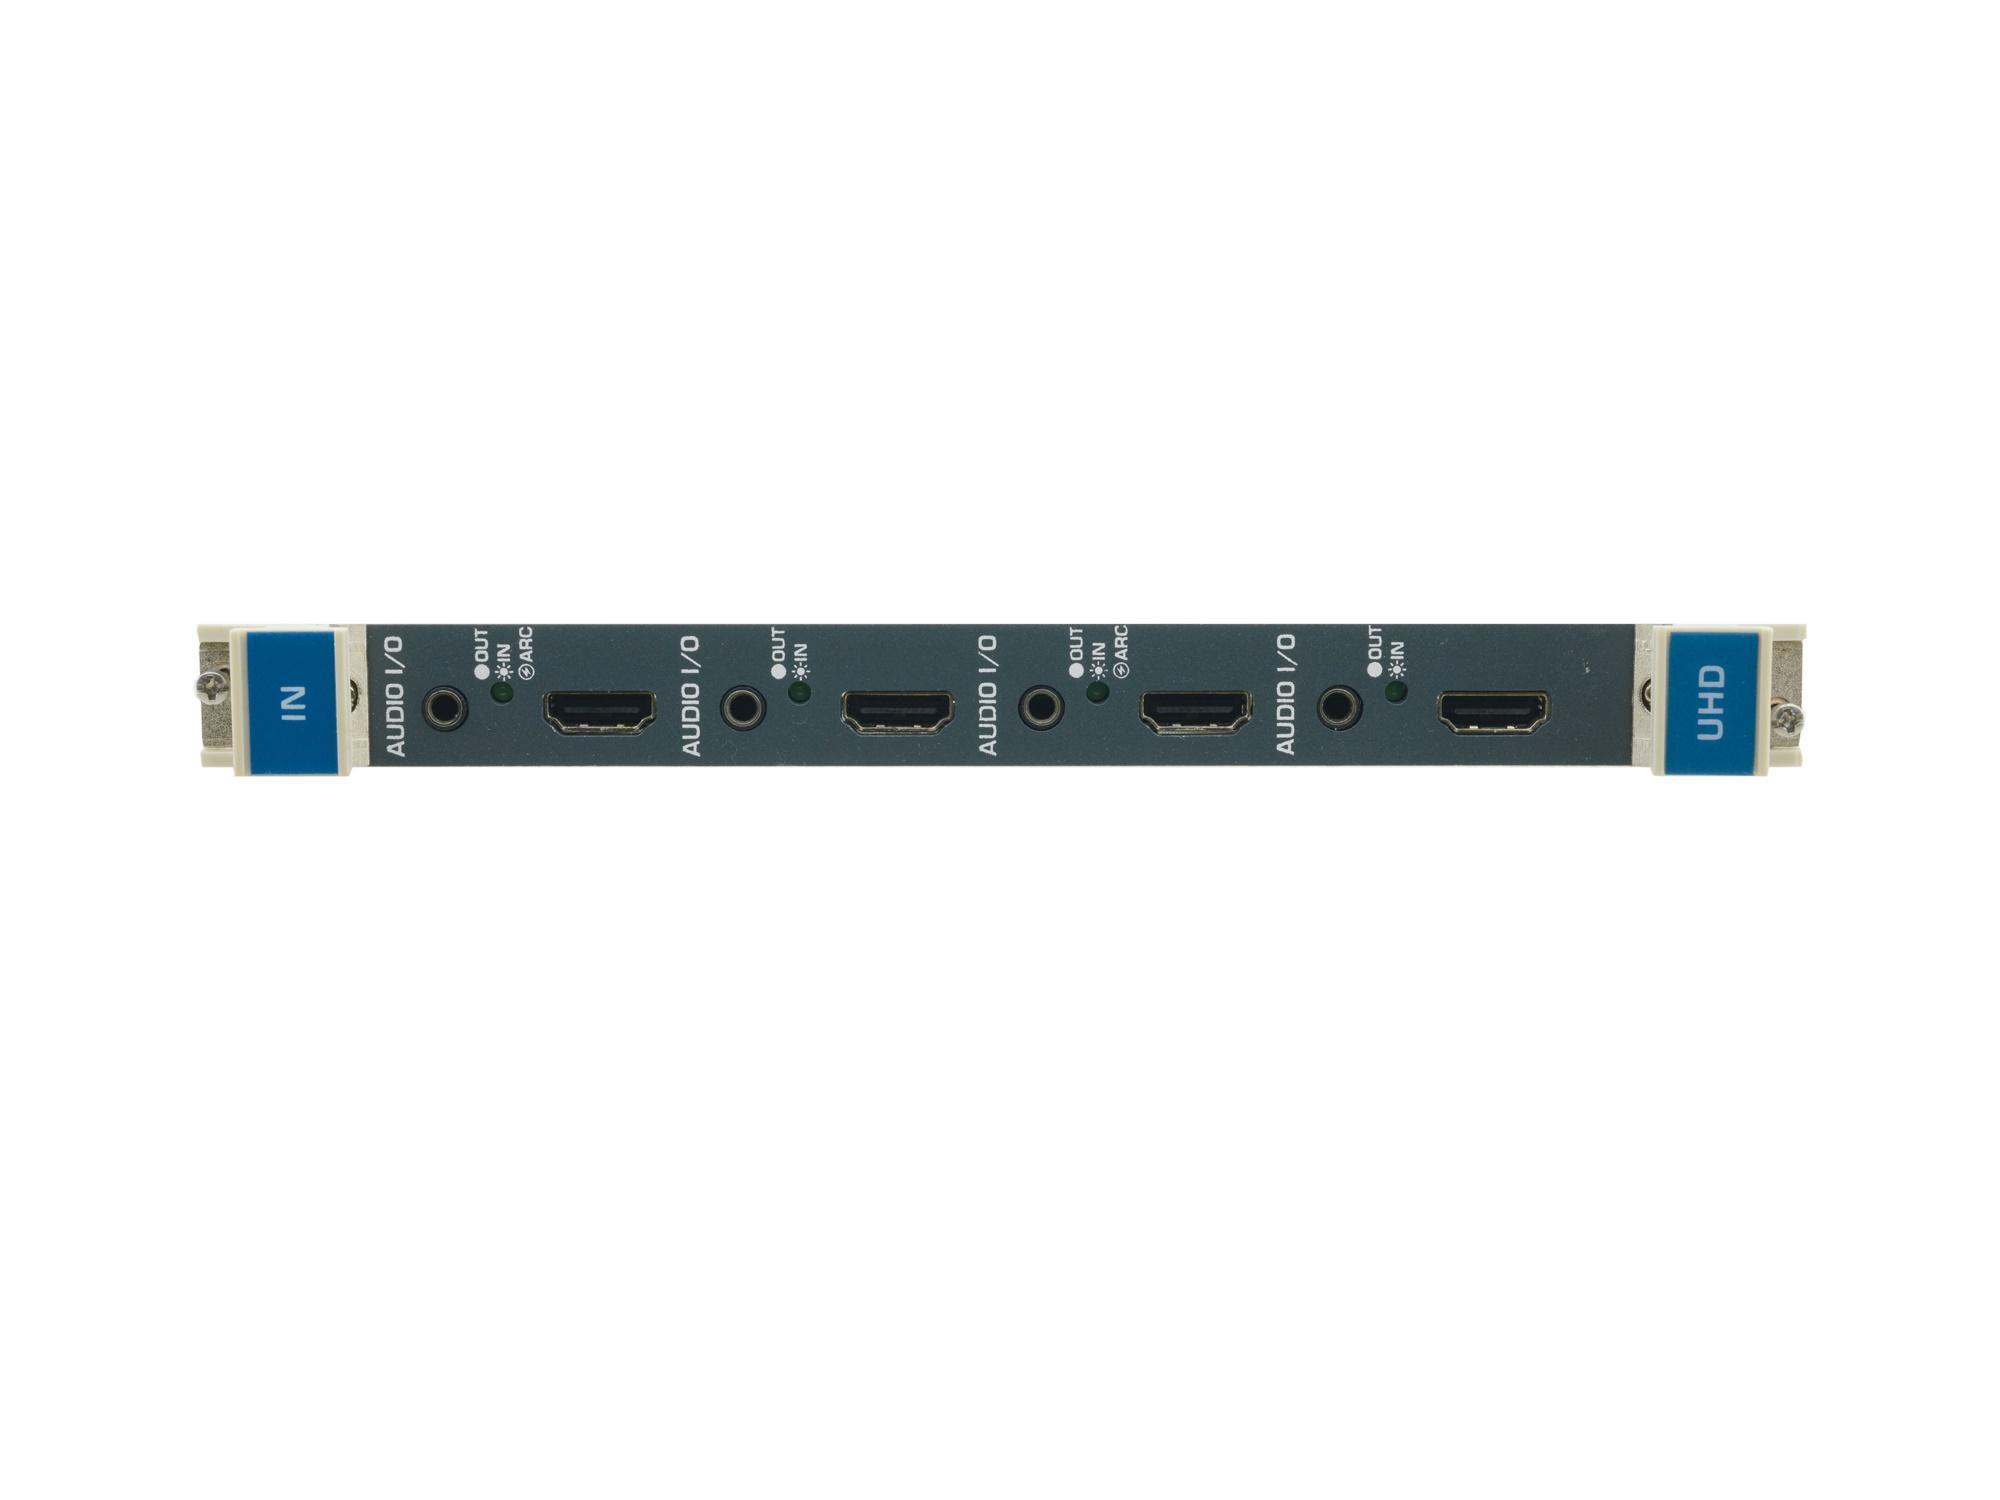 Kramer UHDA-IN4-F32 4-Ch 4K60 4x2x0 HDMI Input Card w Selectable Embedded/De-embedded or ARC Analog Audio